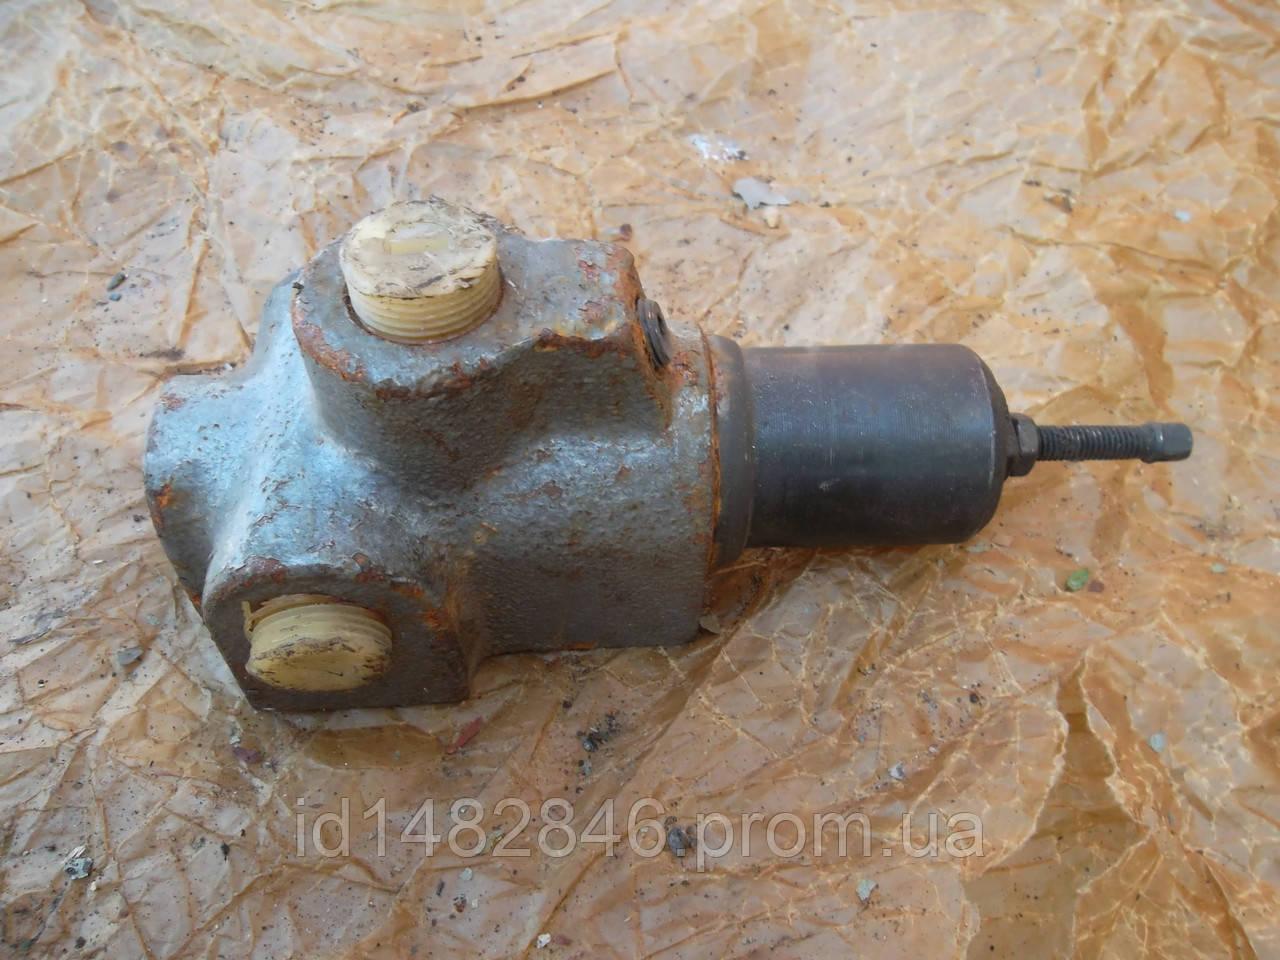 Гидроклапан давления БГ54-34М